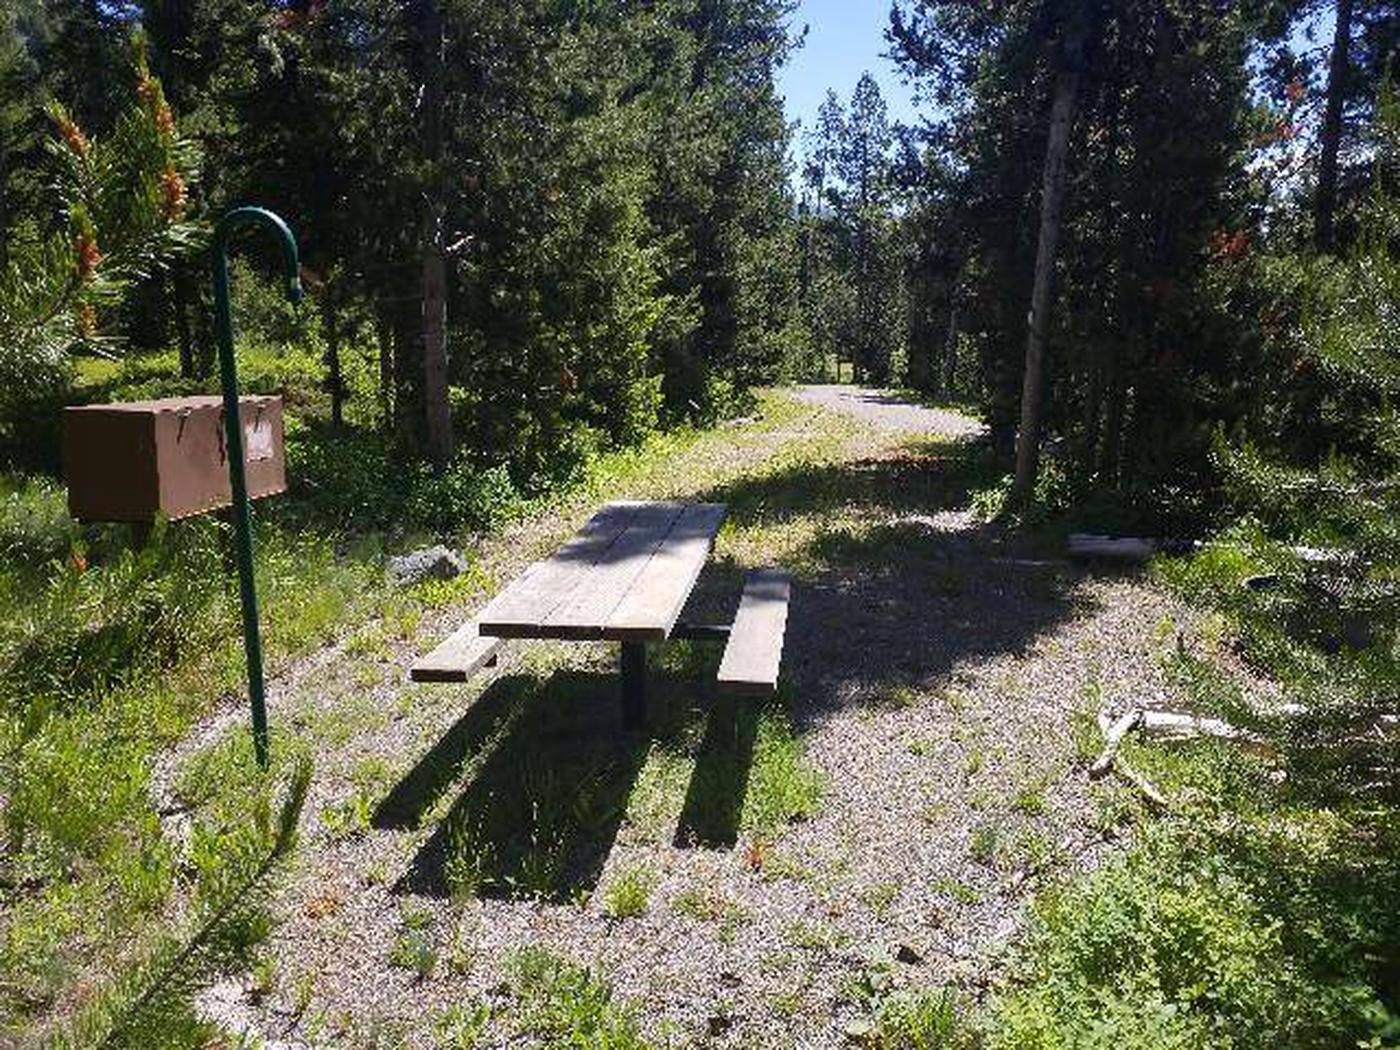 Threemile Campground Campsite 17 - Back View